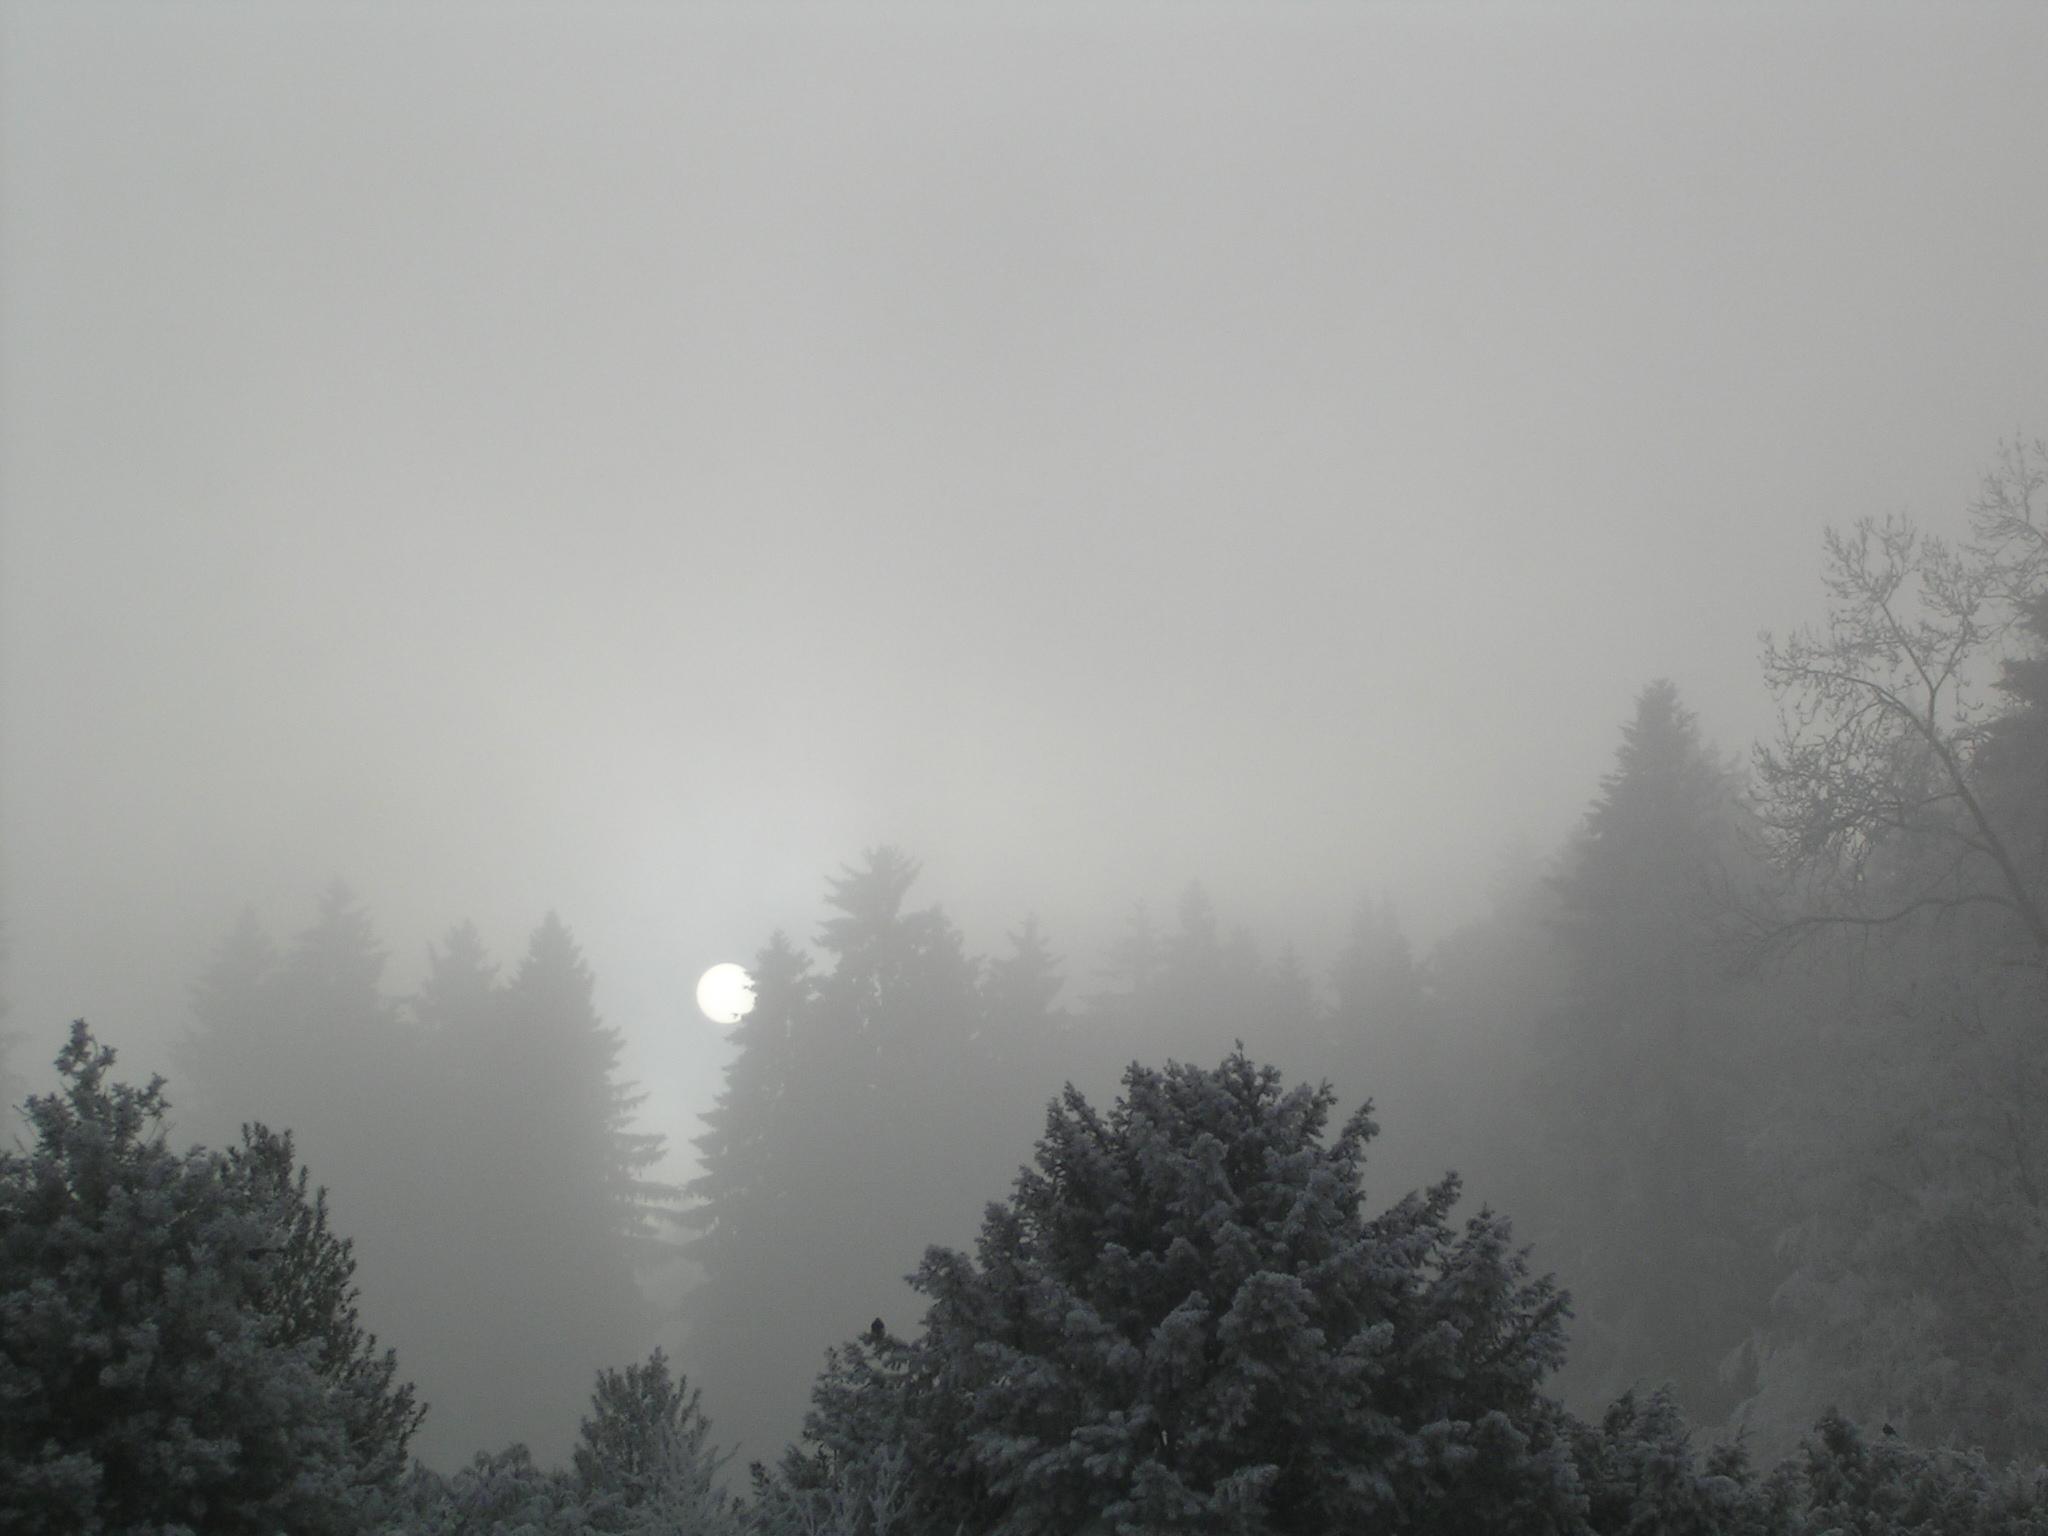 nebel englisch